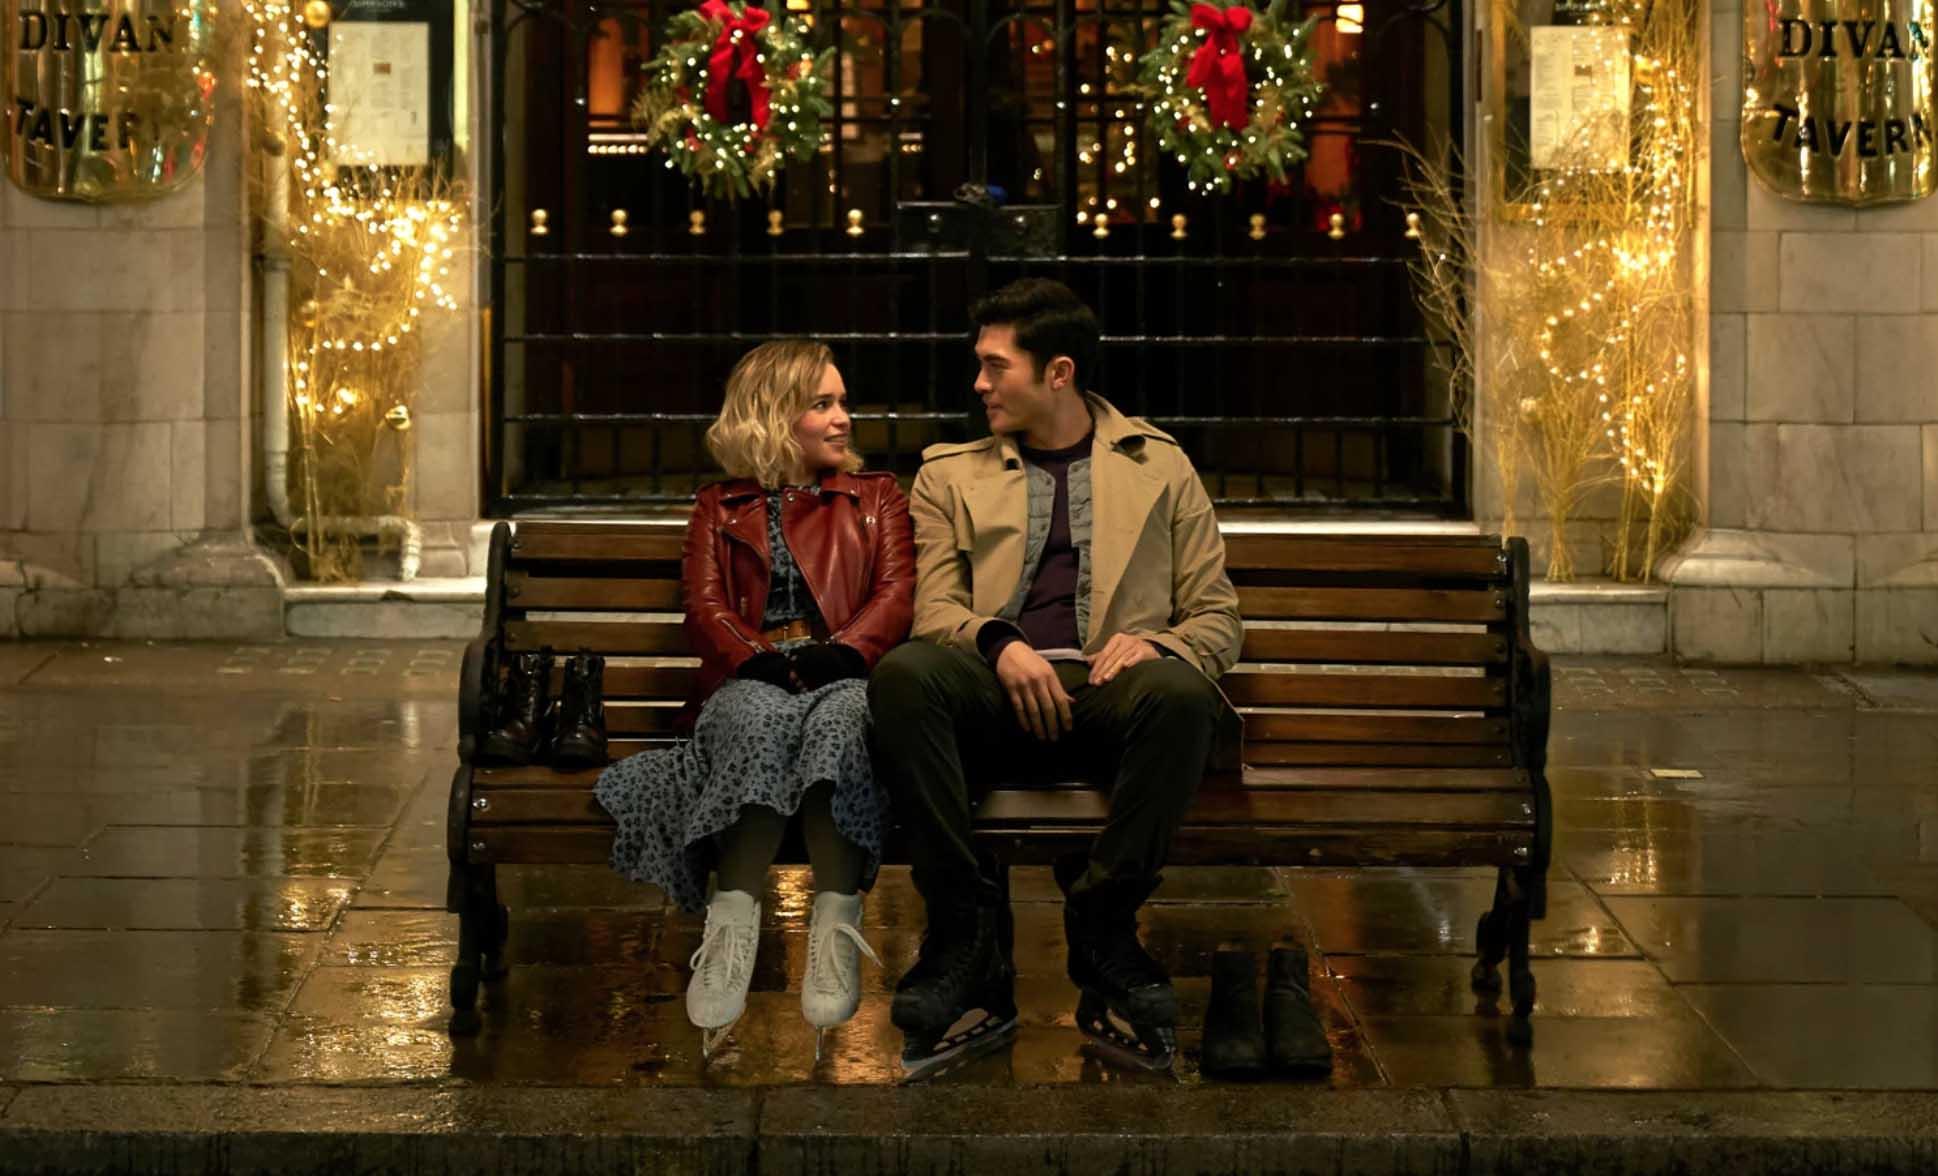 phim tình cảm Last Christmas